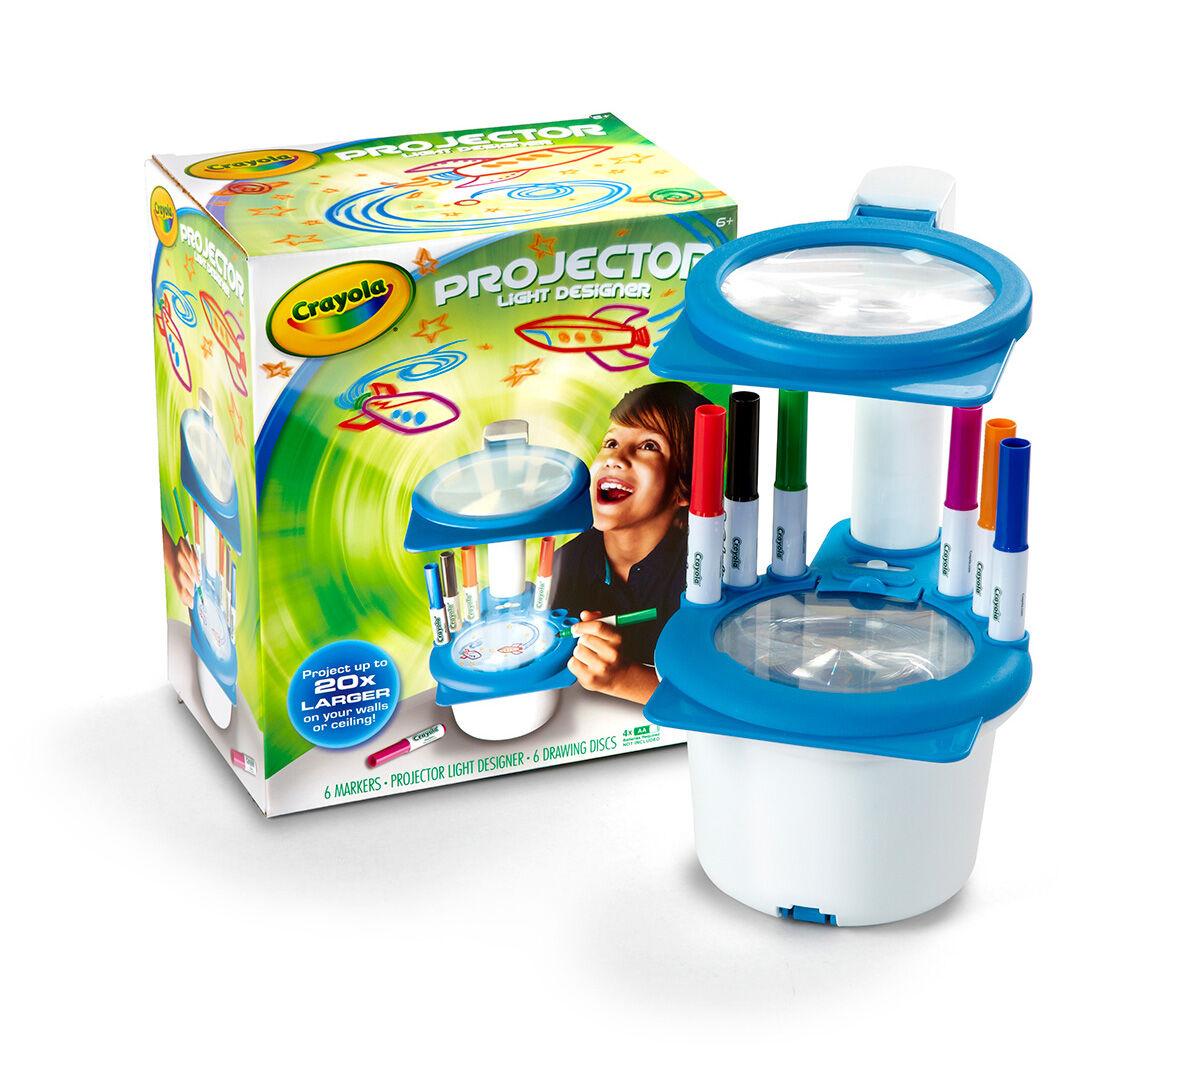 crayola projector light designer & light projector | crayola